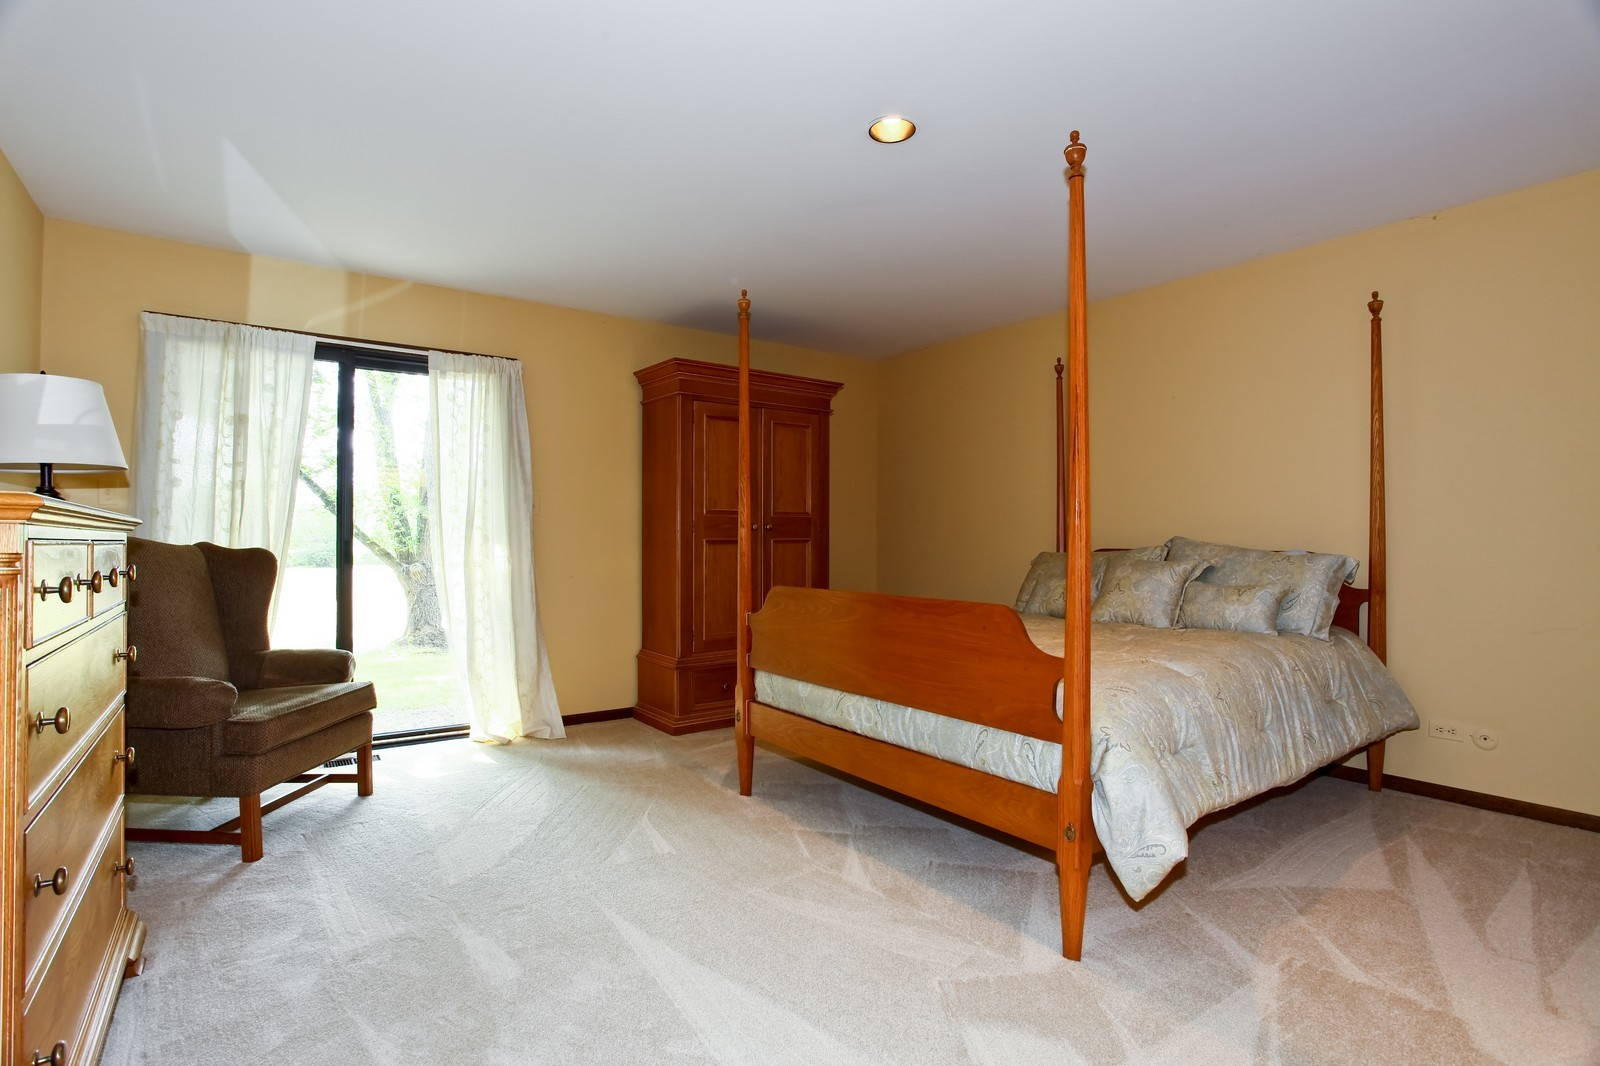 Real Estate Photography - 5N300 Sundance, Saint Charles, IL, 60175 - Master Bedroom